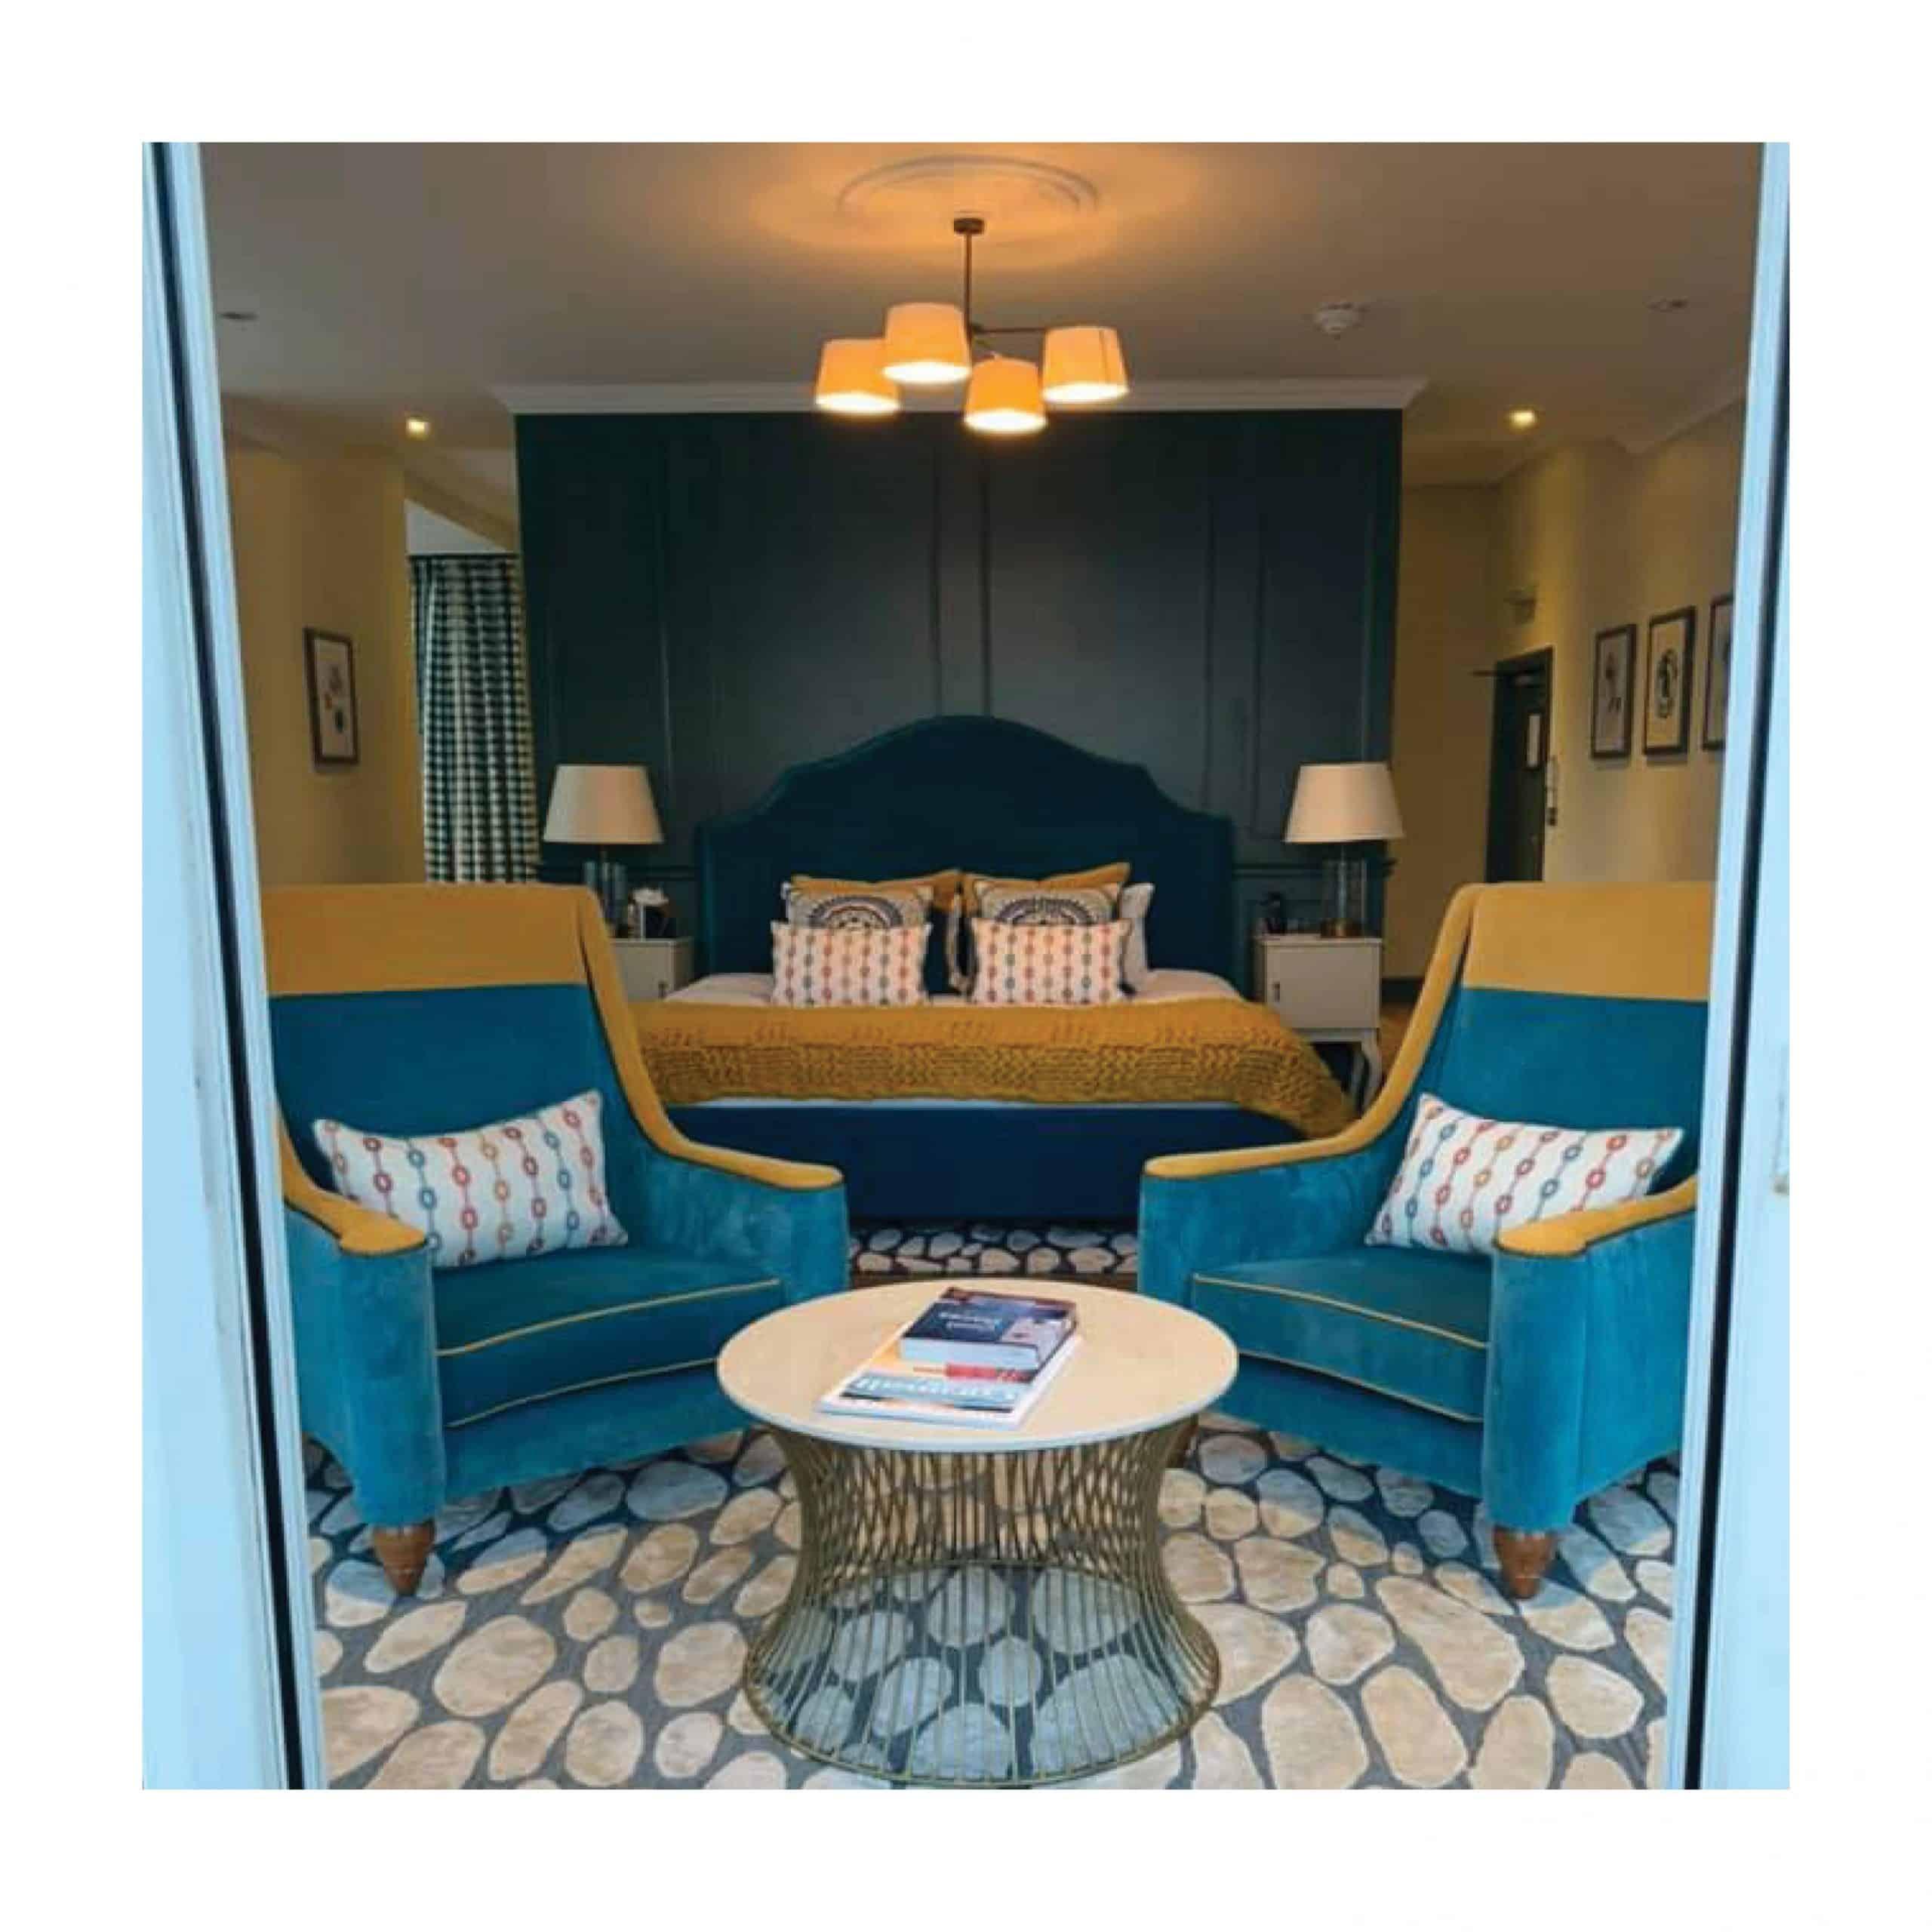 greenbank-memory-lane-competition-the-greenbank-hotel-falmouth-cornwall-lockdown-2020